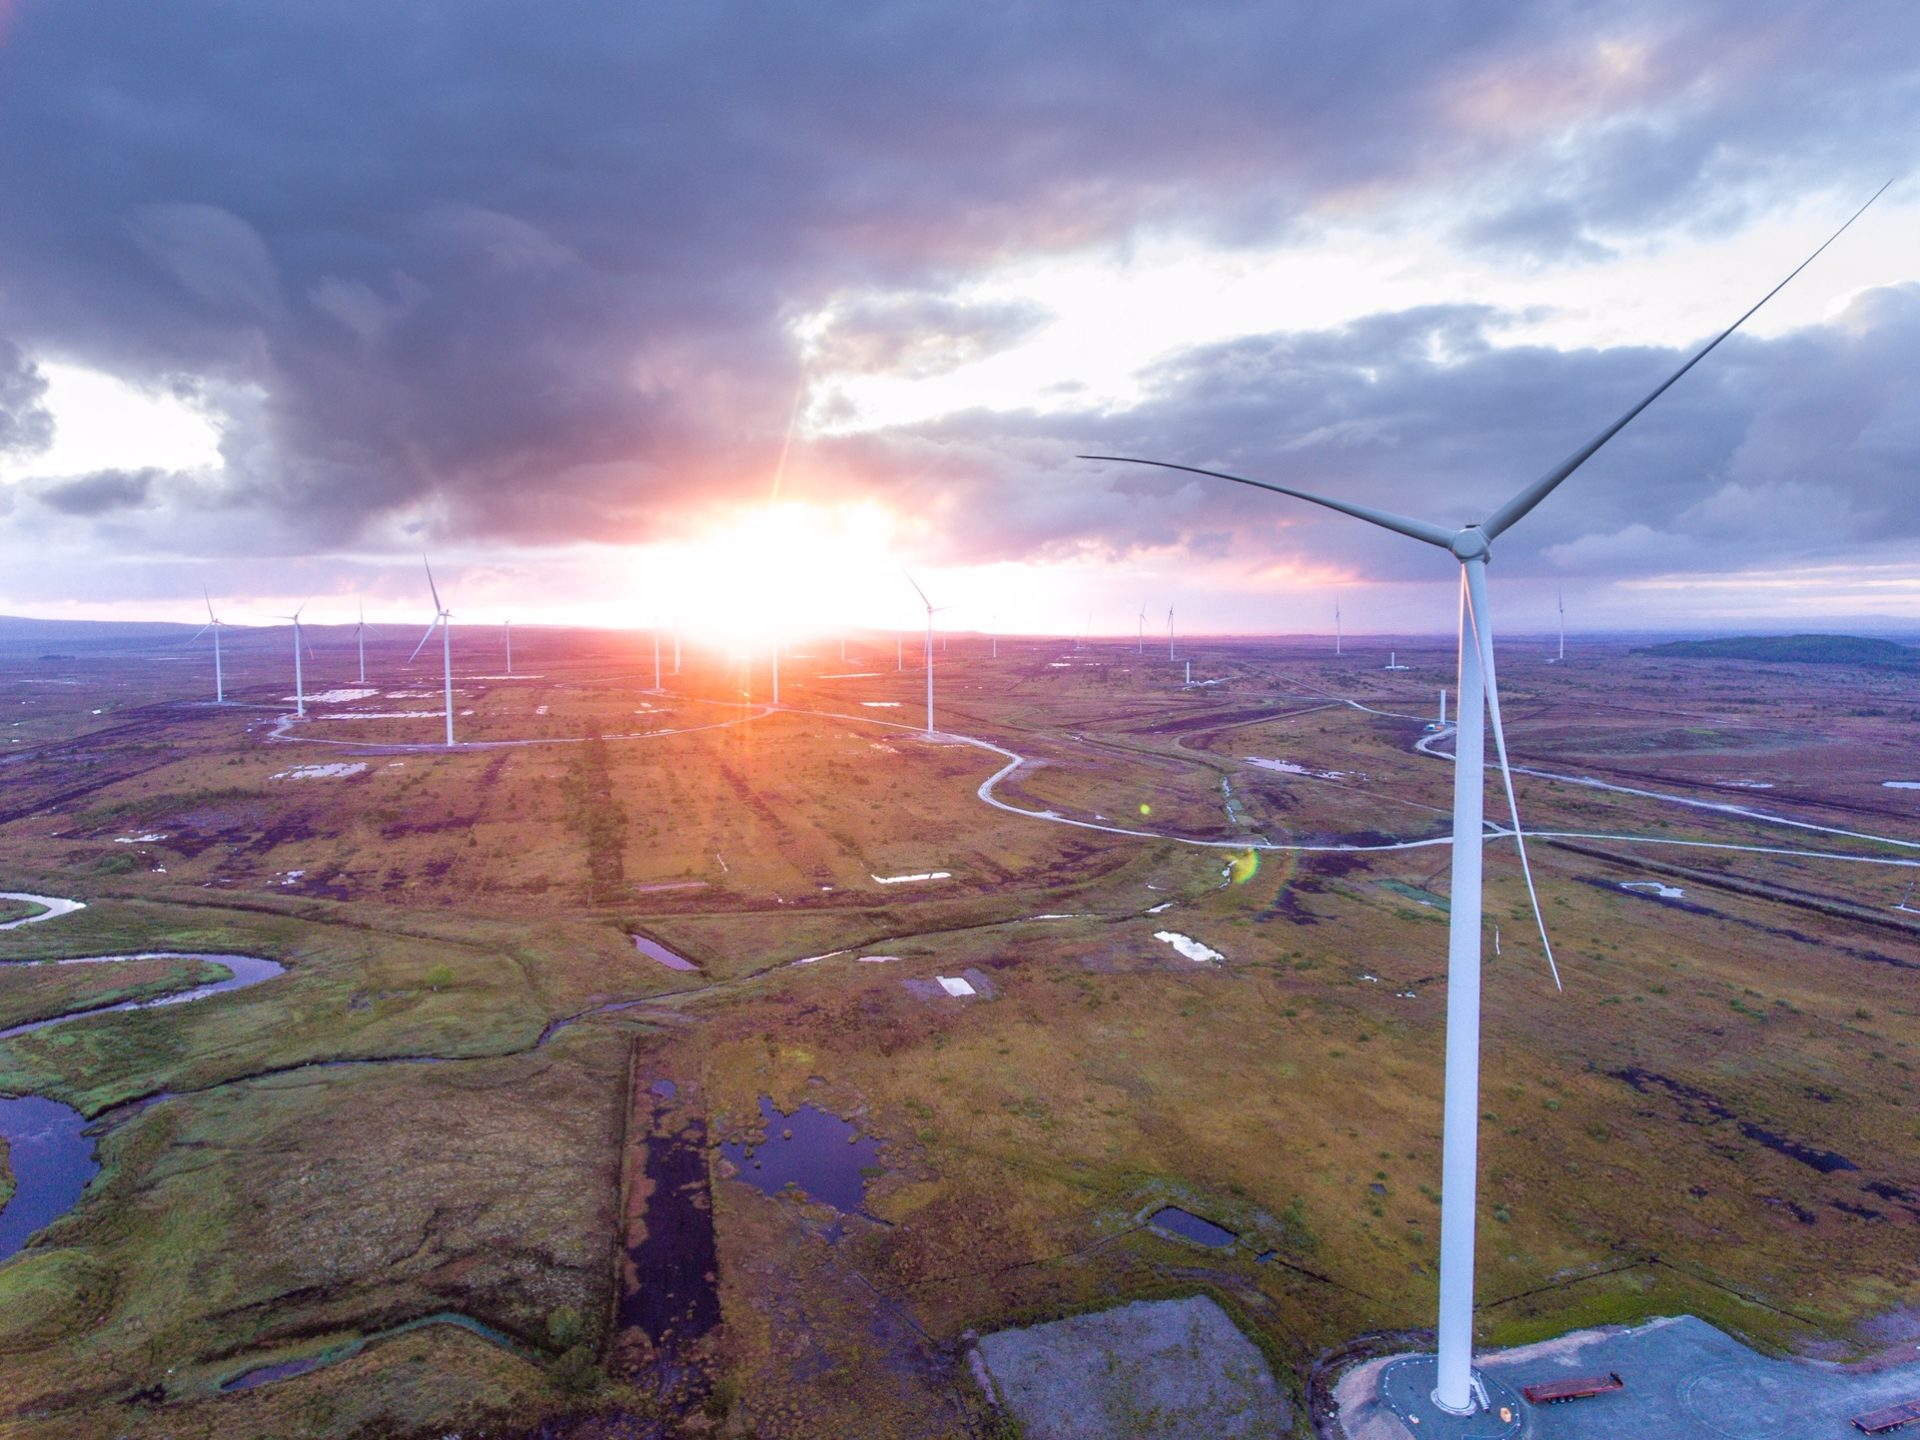 Aerial shot of the Oweninny wind farm site taken at dawn on June 28 last.